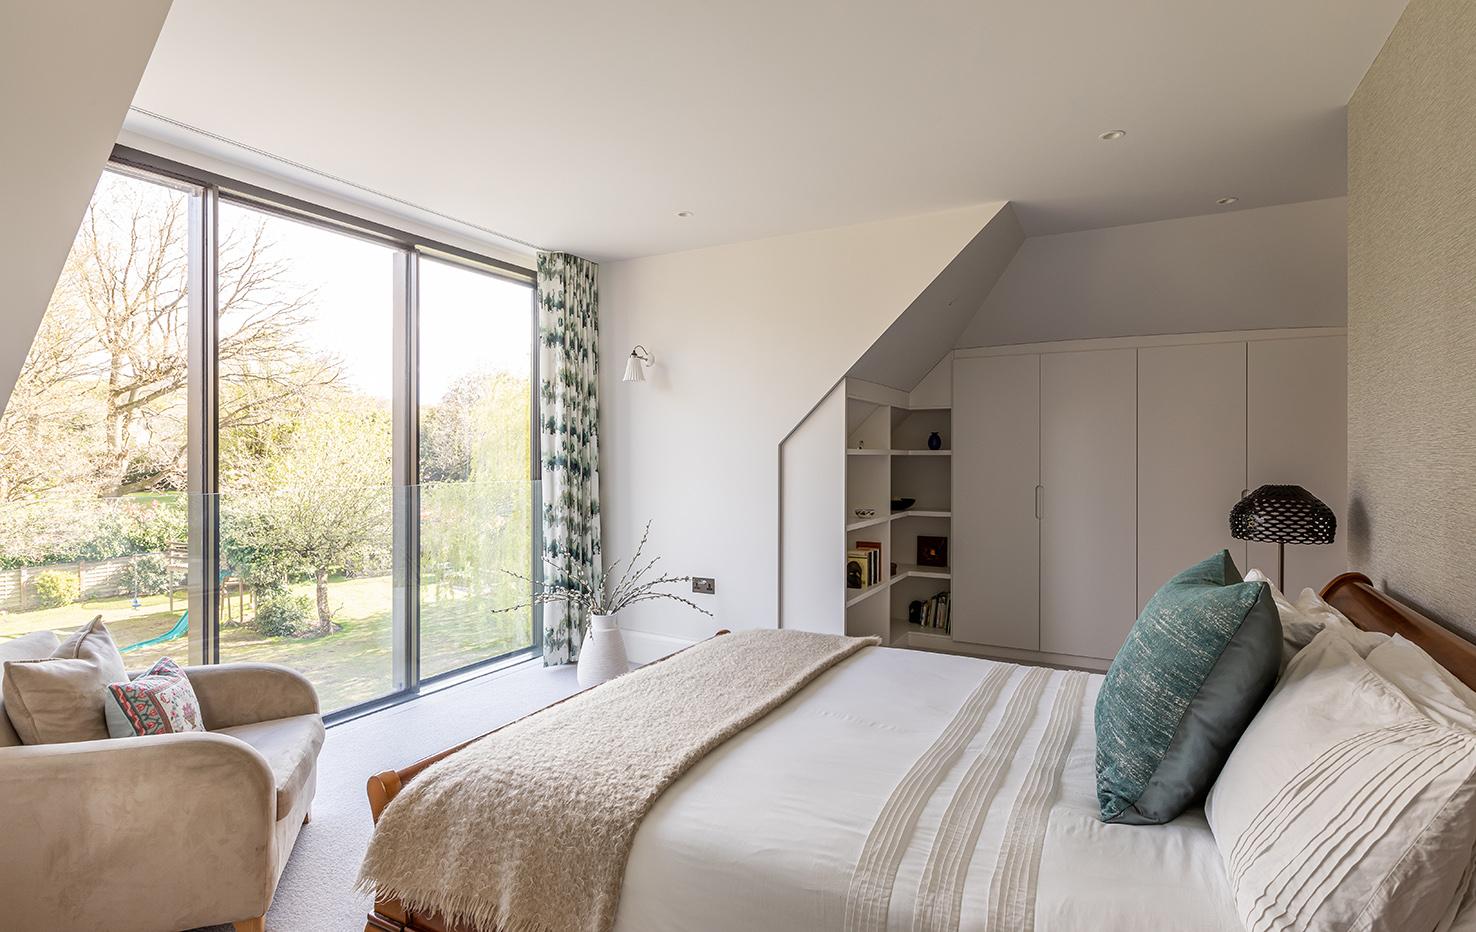 Chilterns-Hill-SL320-Rooflight-Fixed-Window_5